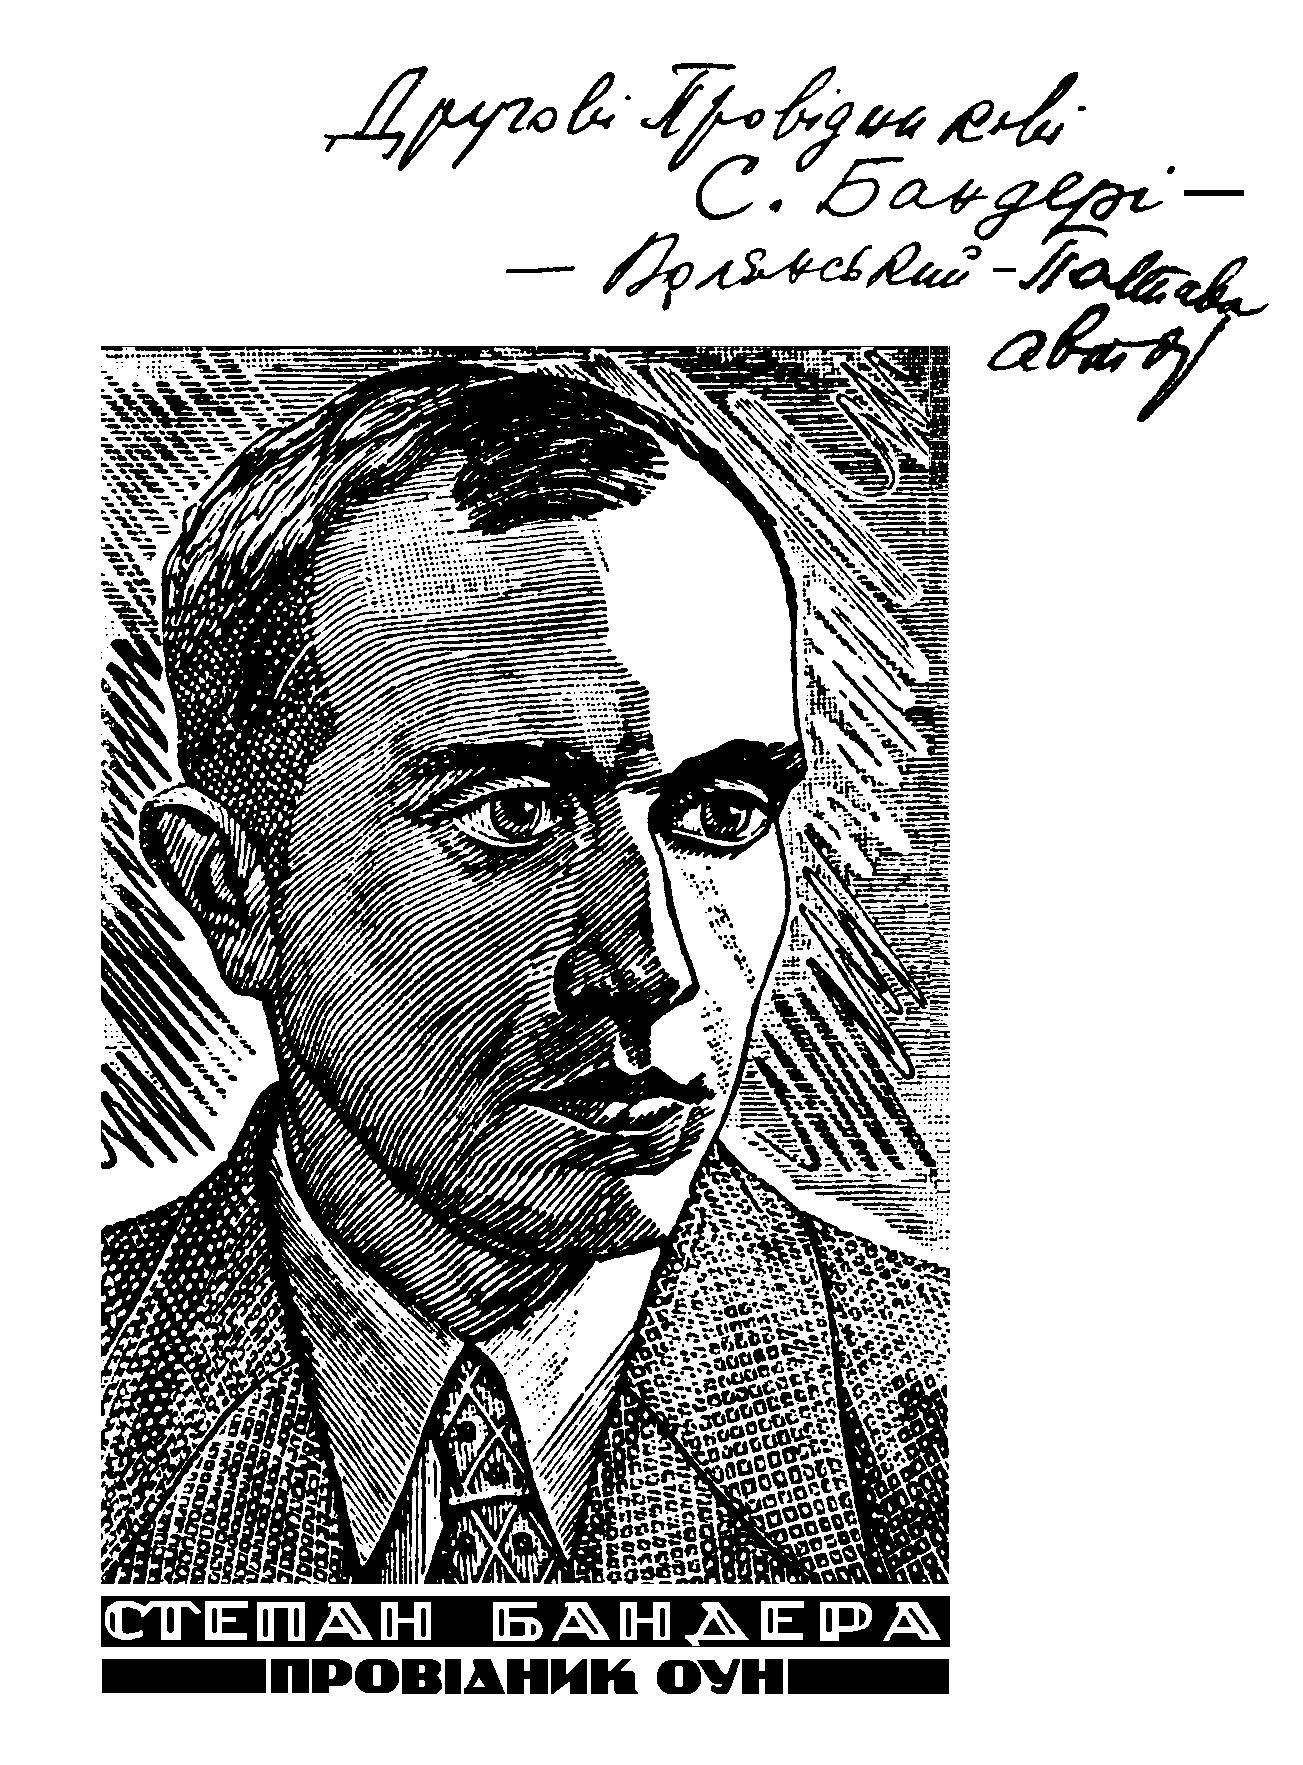 Степан Бандера. Провідник ОУН